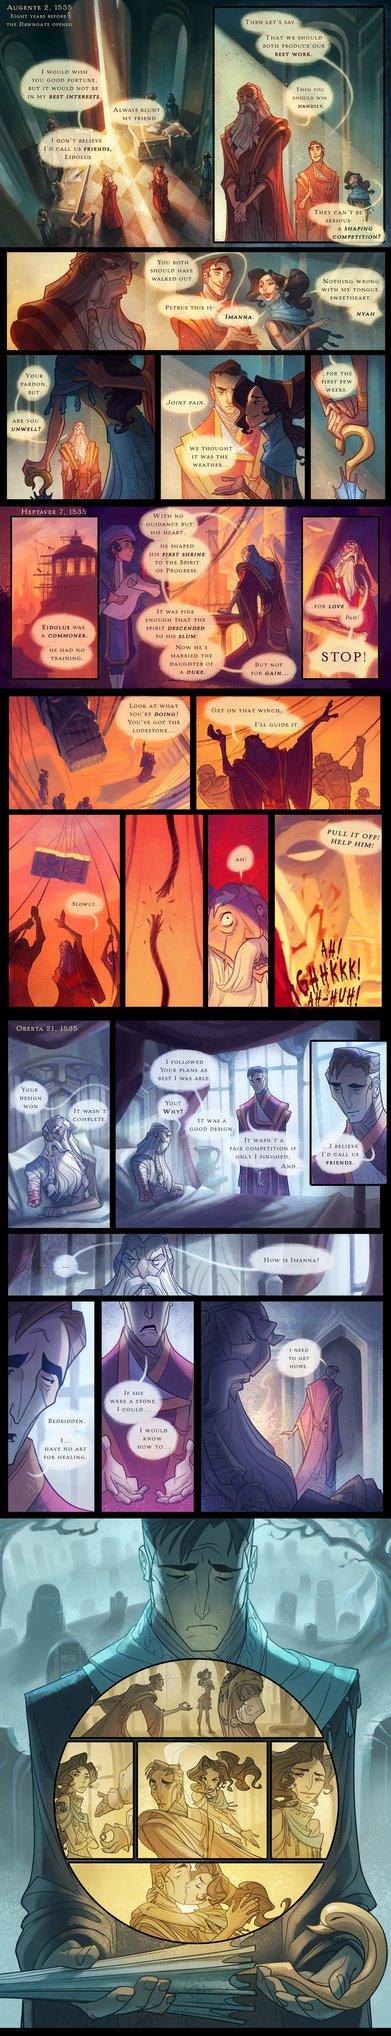 The Dawngate Chronicles - Prologue by nicholaskole